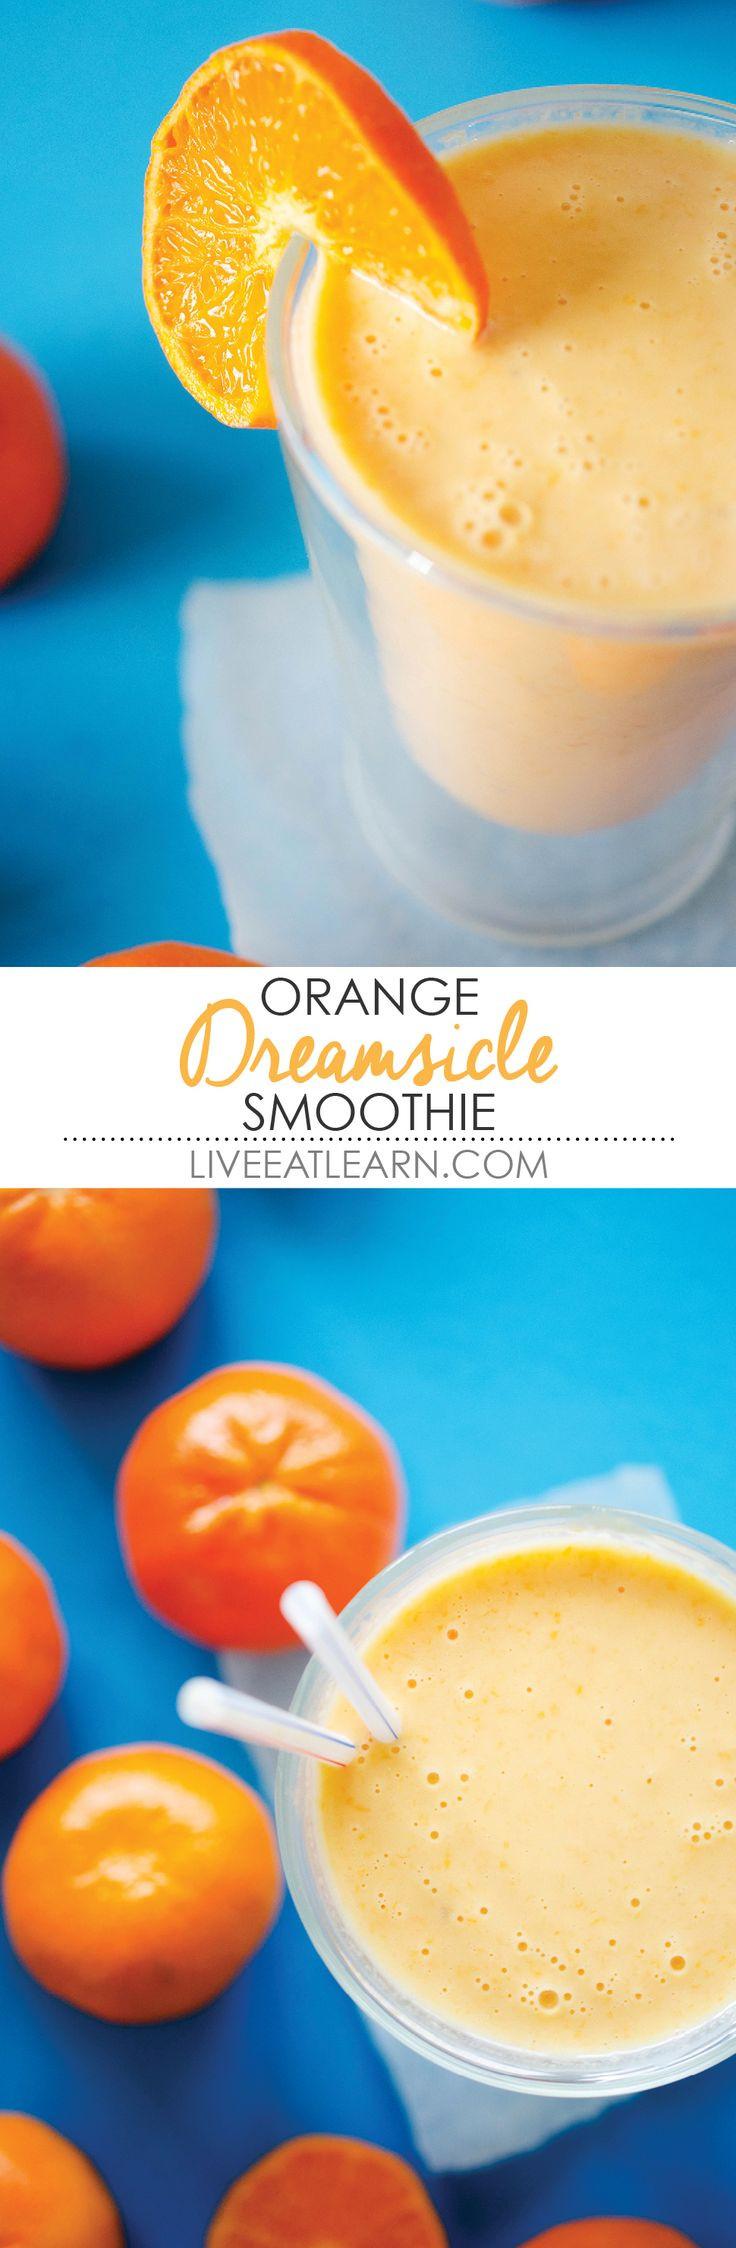 Healthy Smoothie Recipes With Yogurt  Best 25 Orange creamsicle ideas on Pinterest